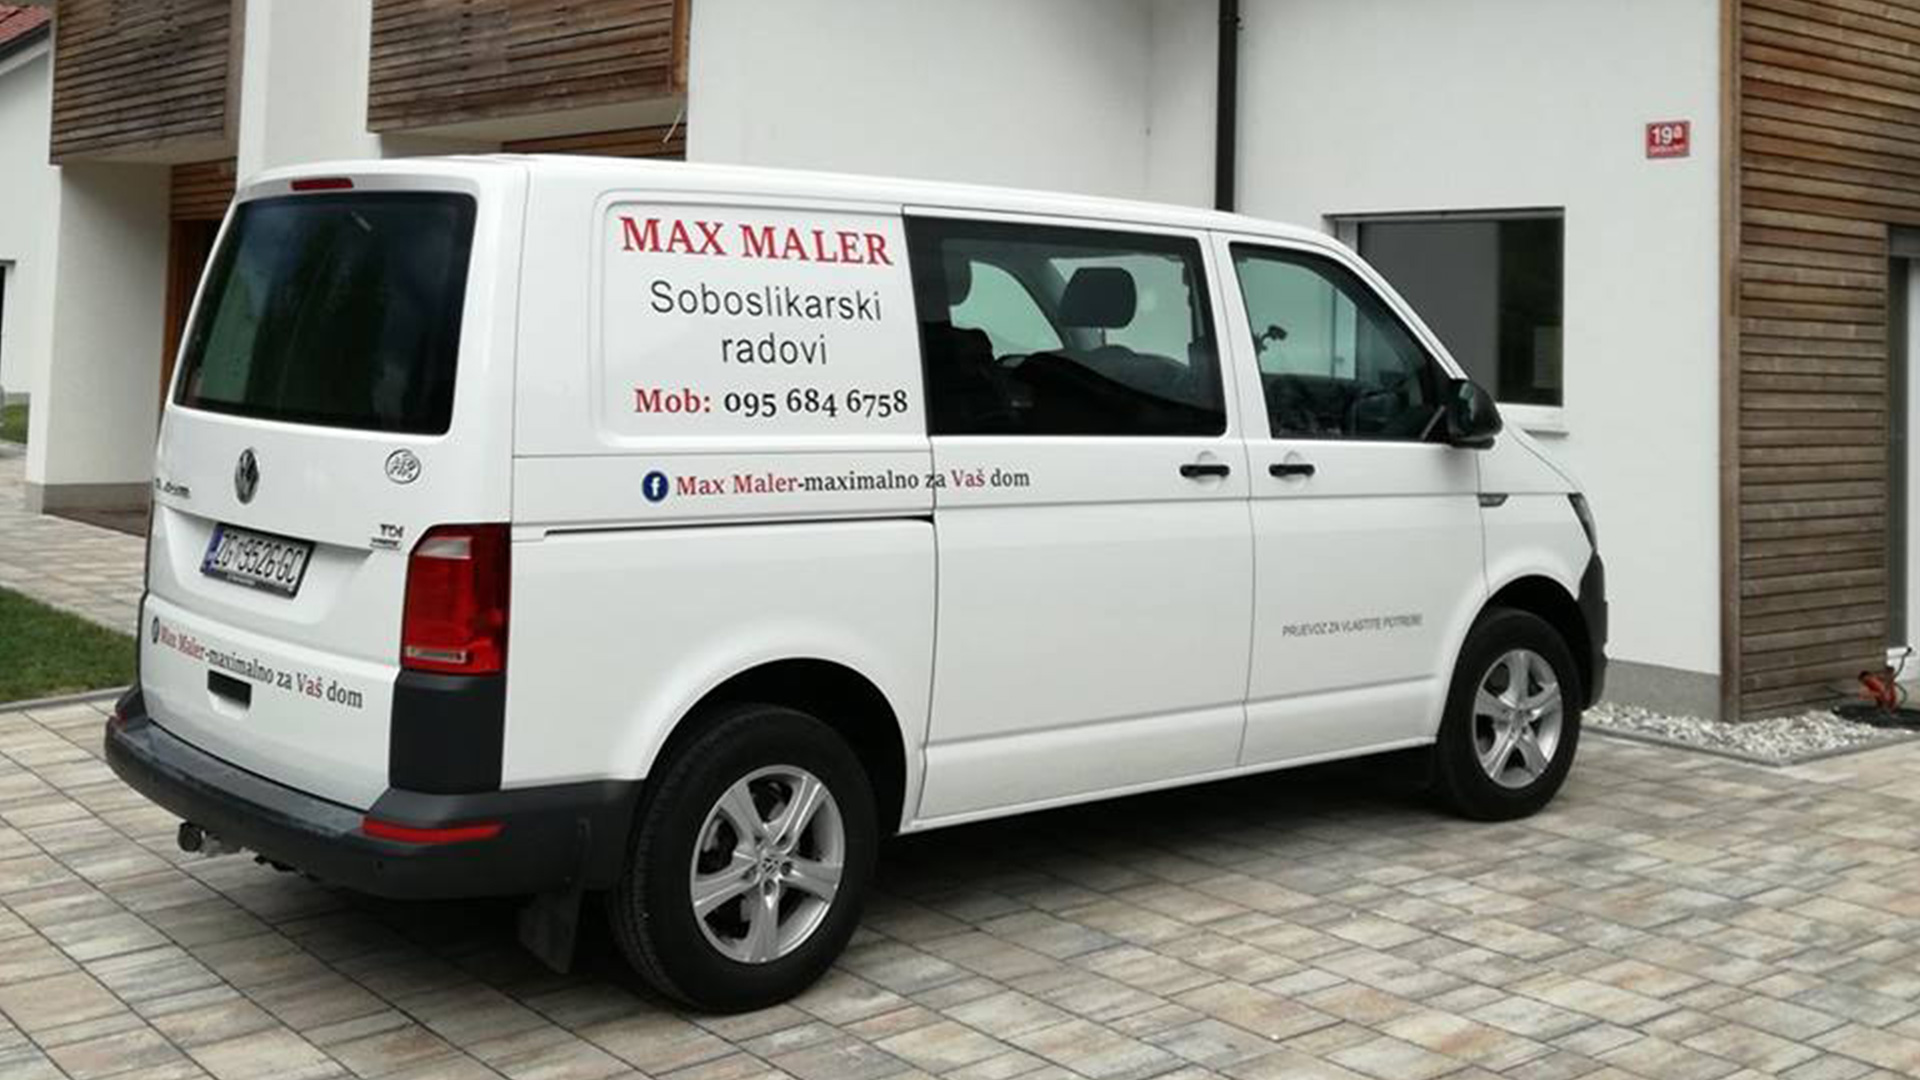 Max maler